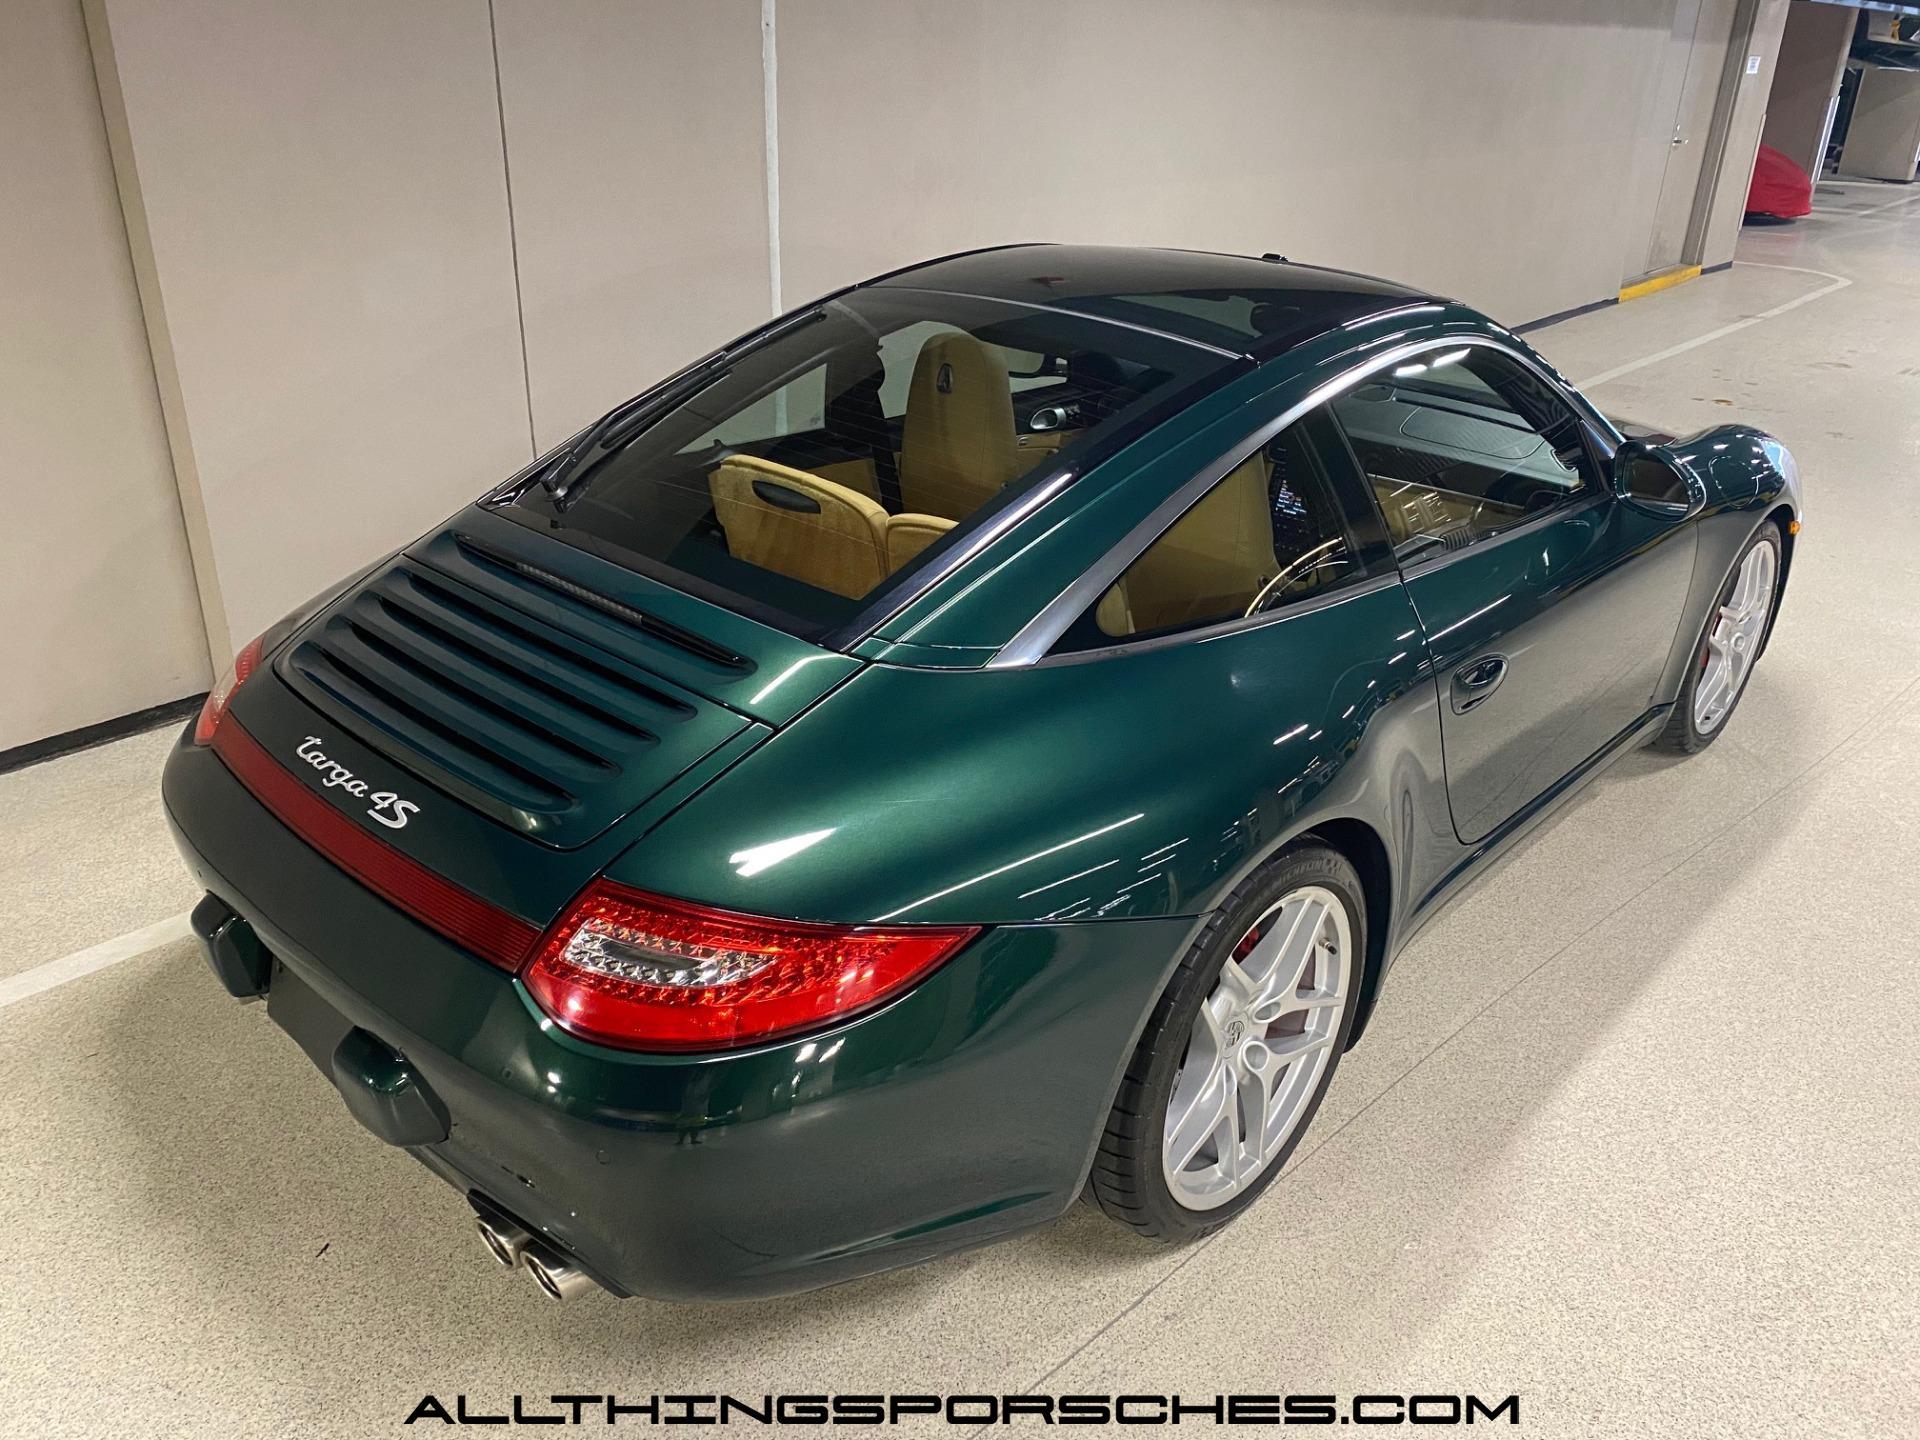 Used-2011-Porsche-911-Targa-4S